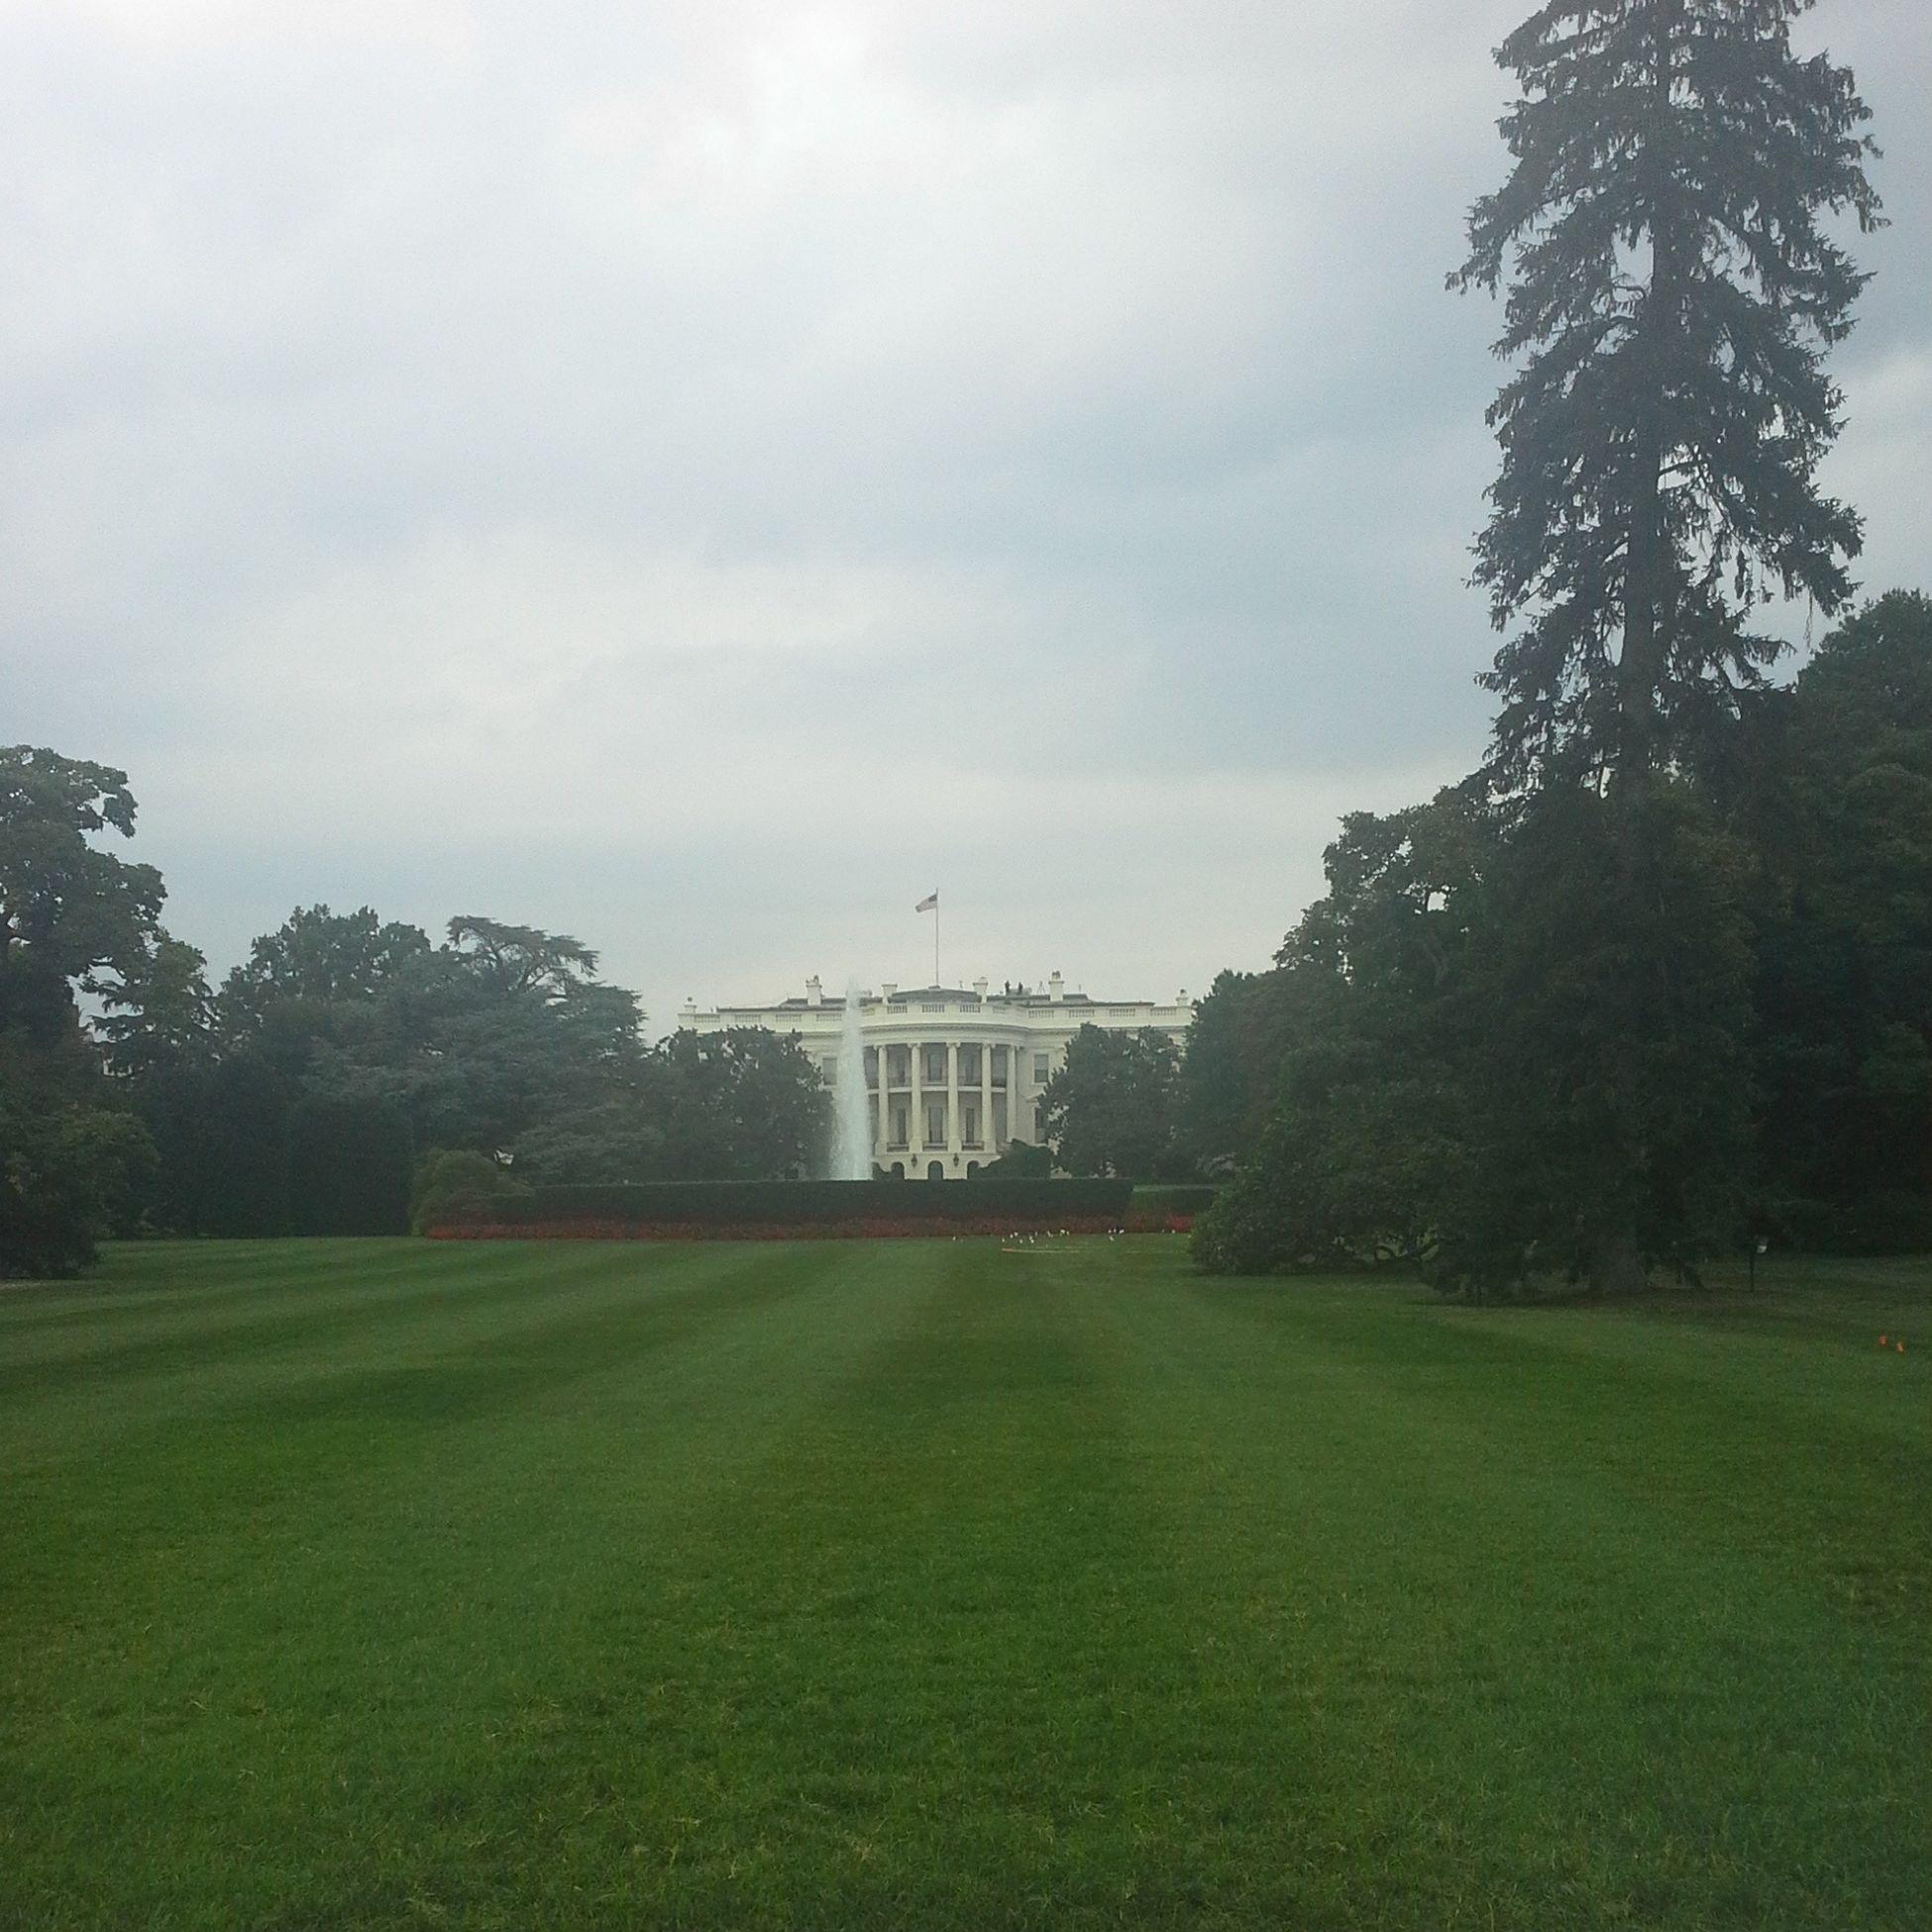 The White House Taking Photos Hello World Hanging Out Enjoying Life